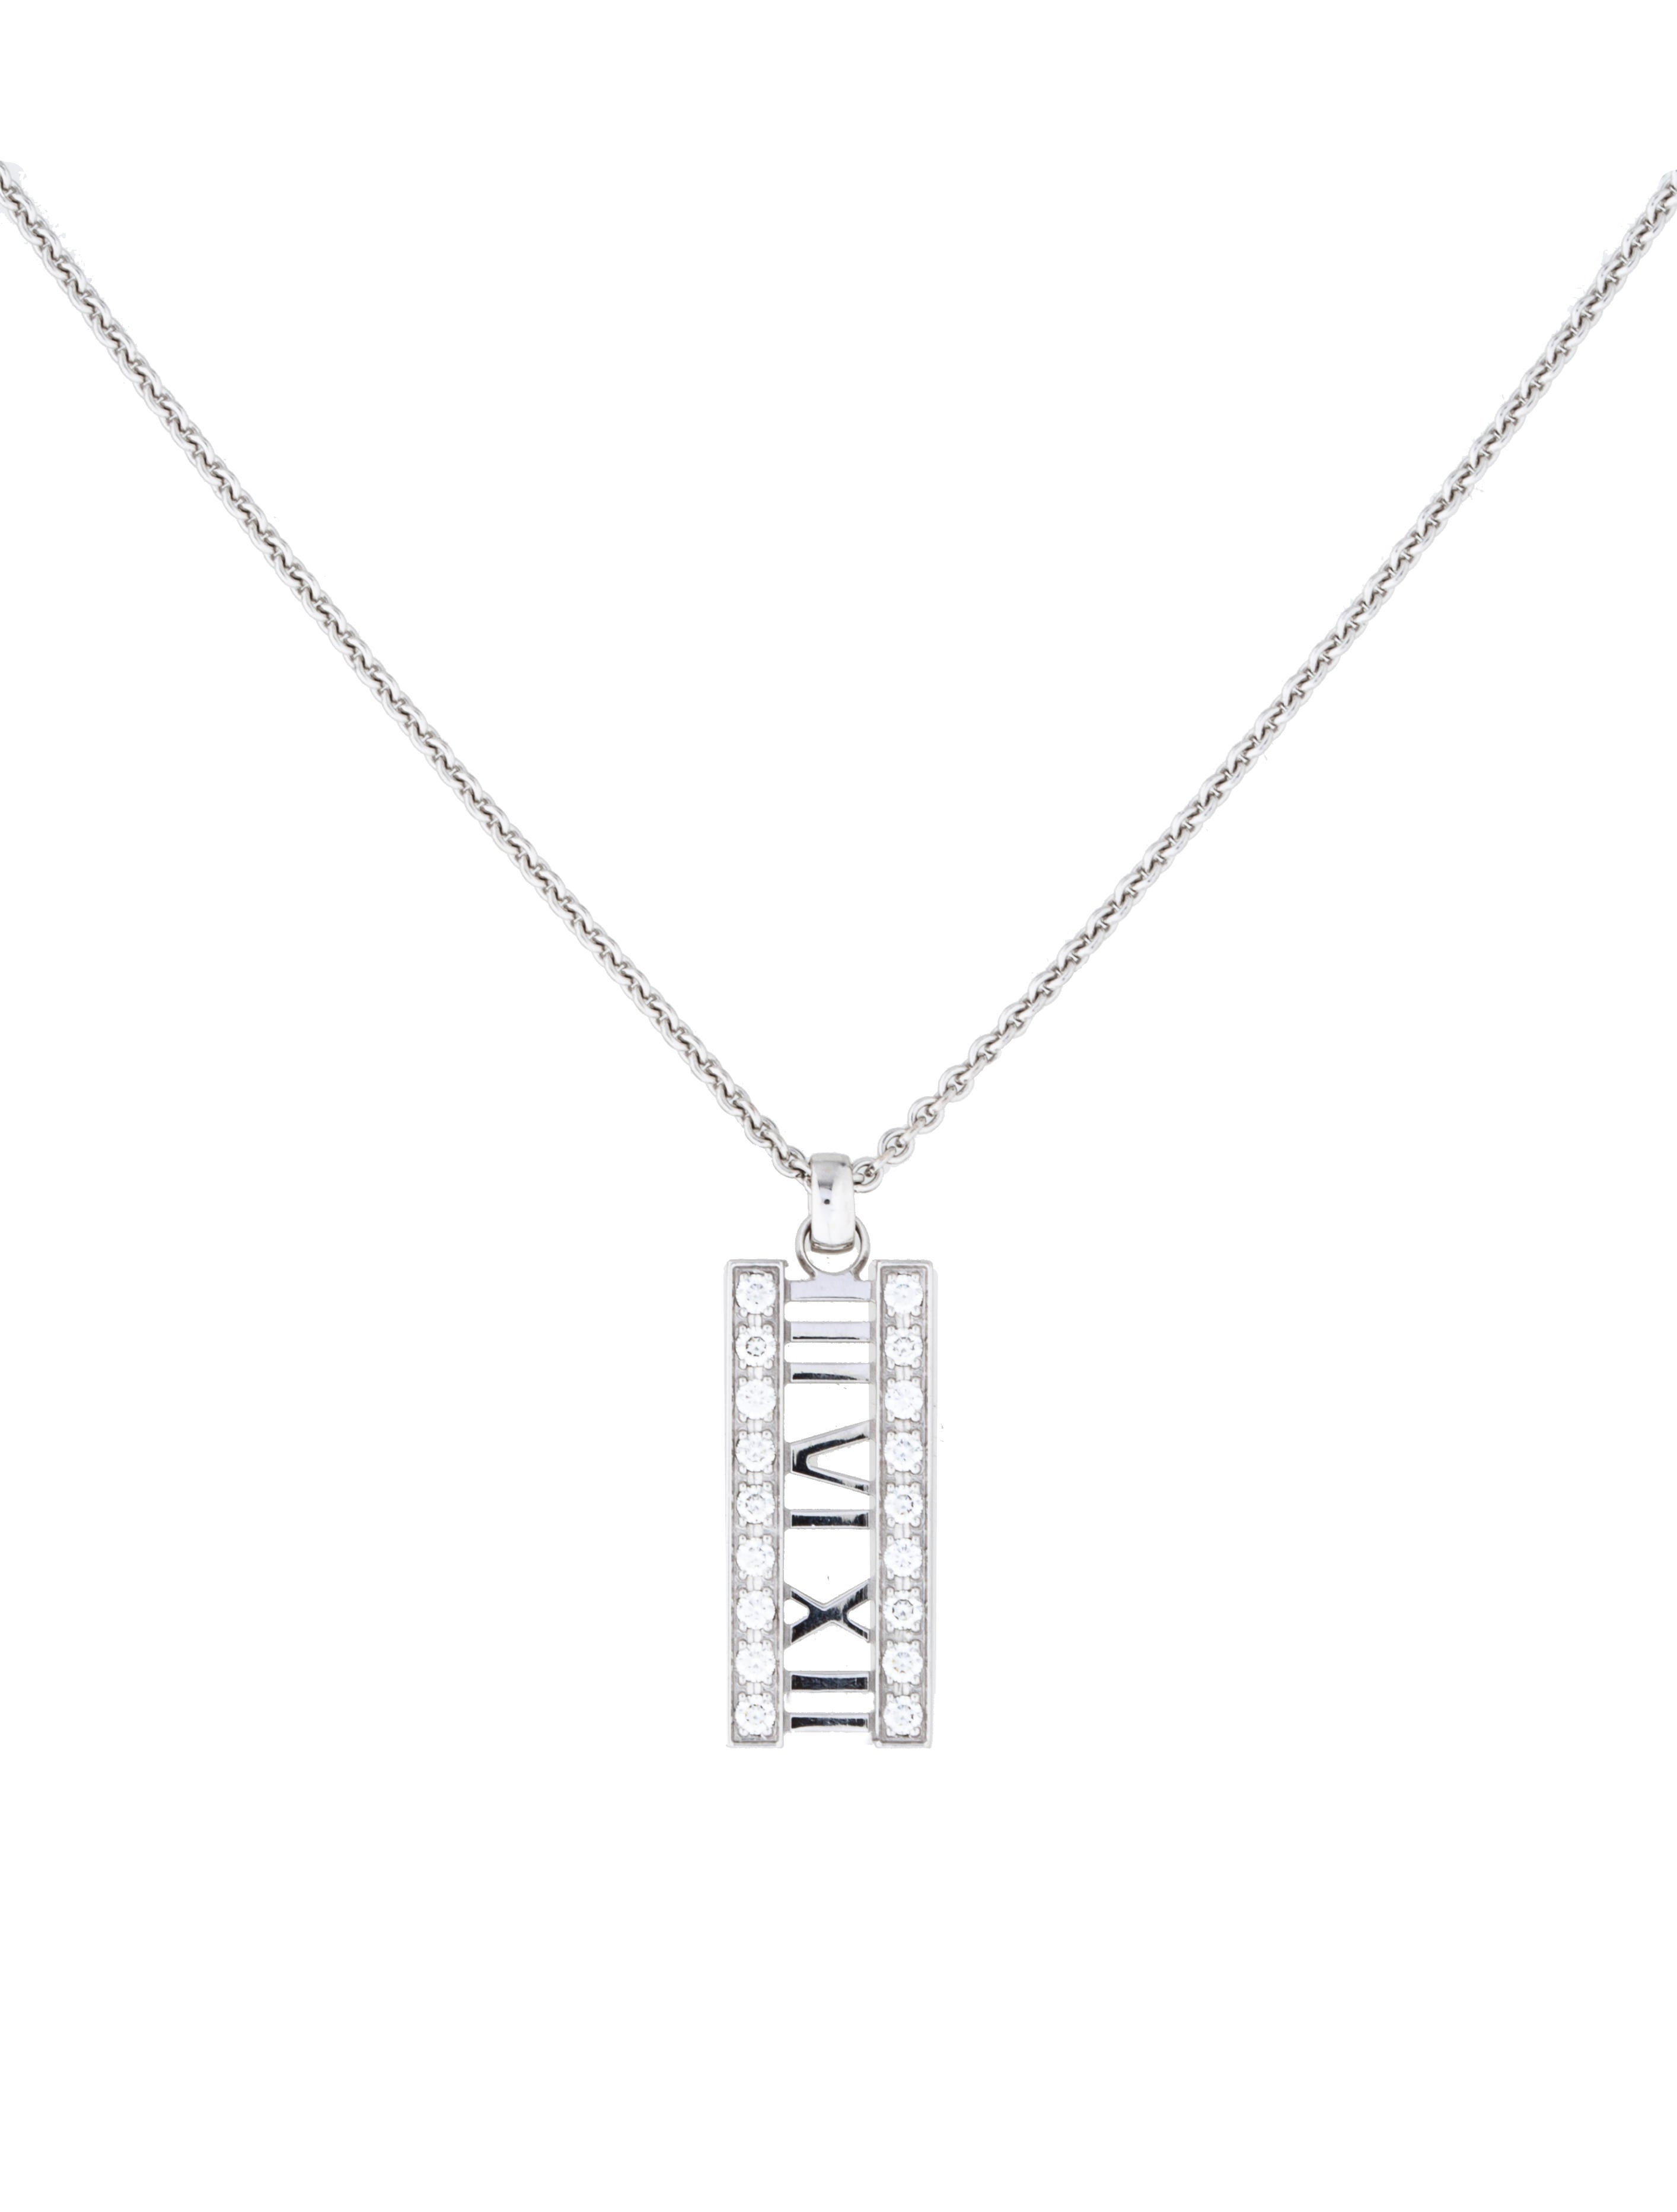 f9f187150 Tiffany & Co. 18K Diamond Atlas Pendant Necklace - Necklaces ...